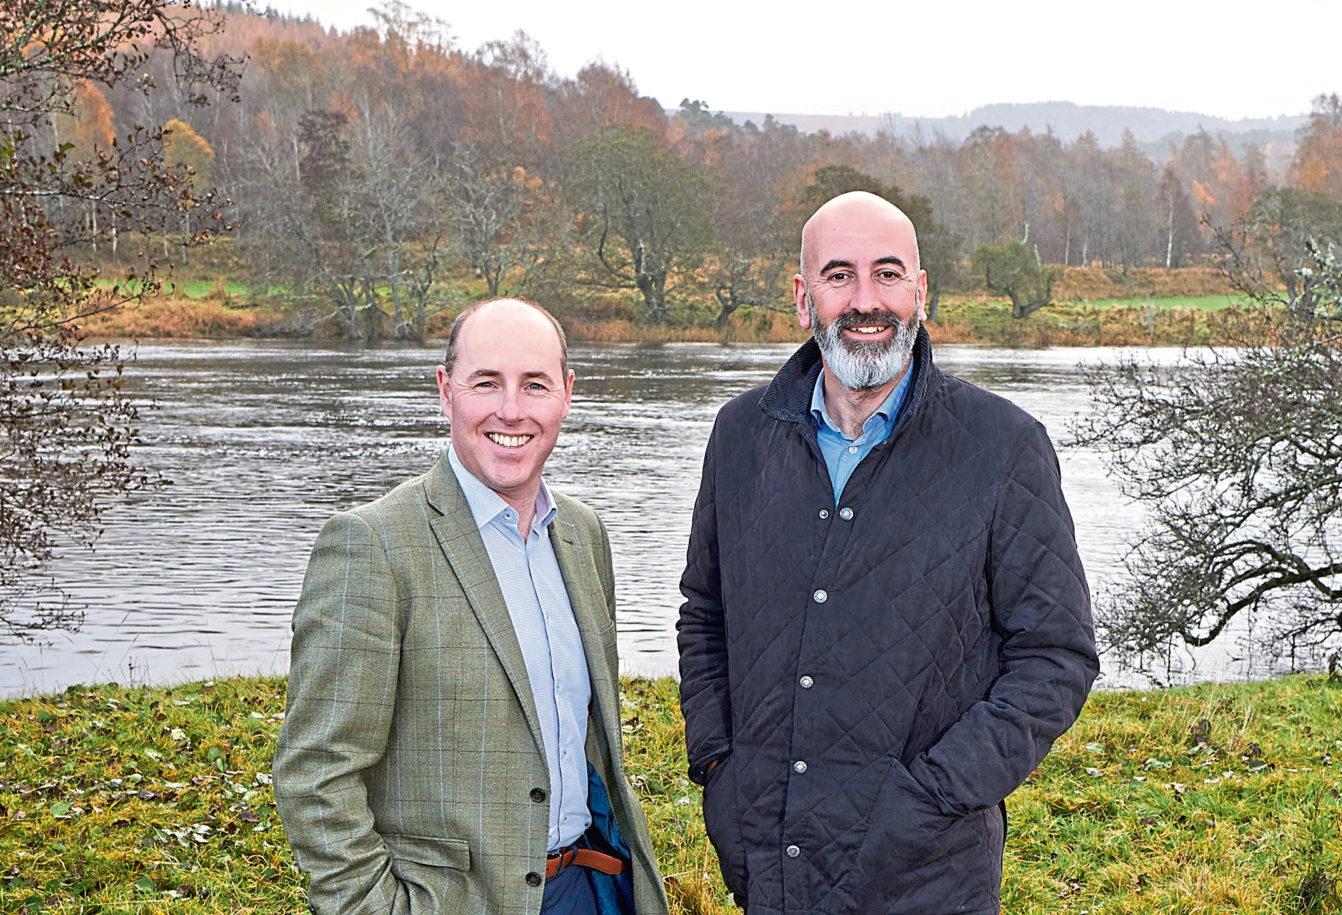 Stephen Rankin, Gordon & MacPhail director of prestige (left) and Ewen Mackintosh, Gordon & MacPhail managing director (right).